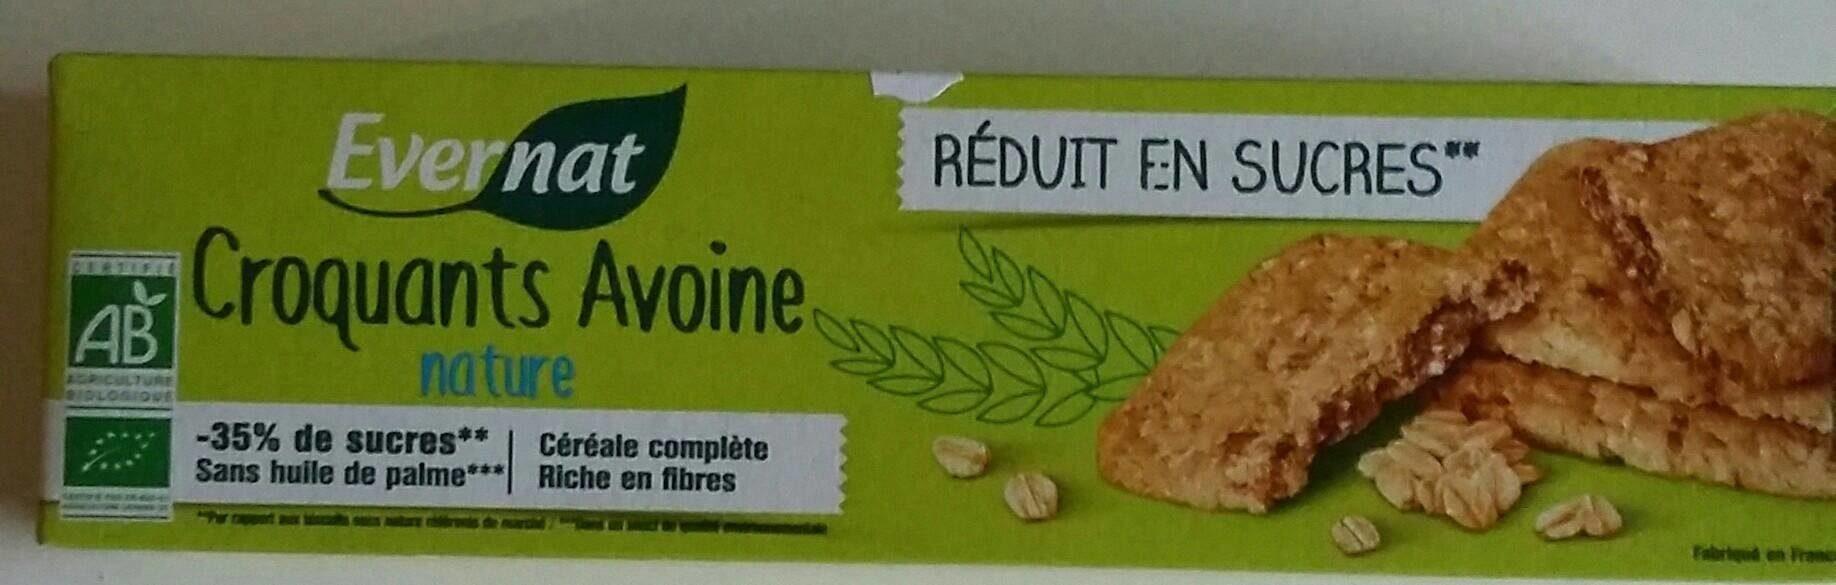 Croquants Avoine nature - Product